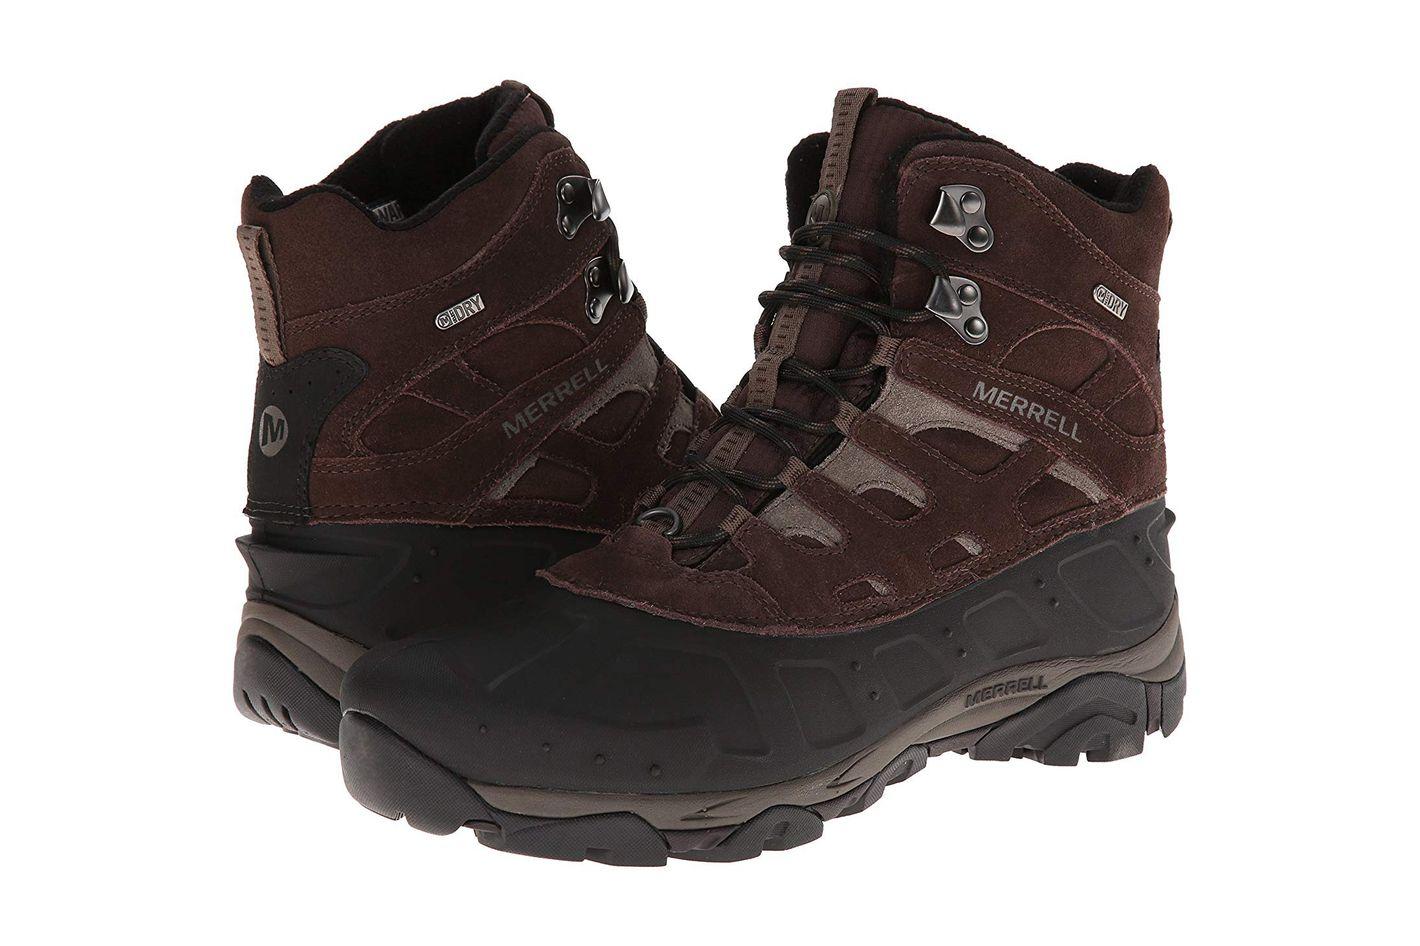 56b998399a28 Merrell Men s Moab Polar Waterproof Winter Boot at Amazon